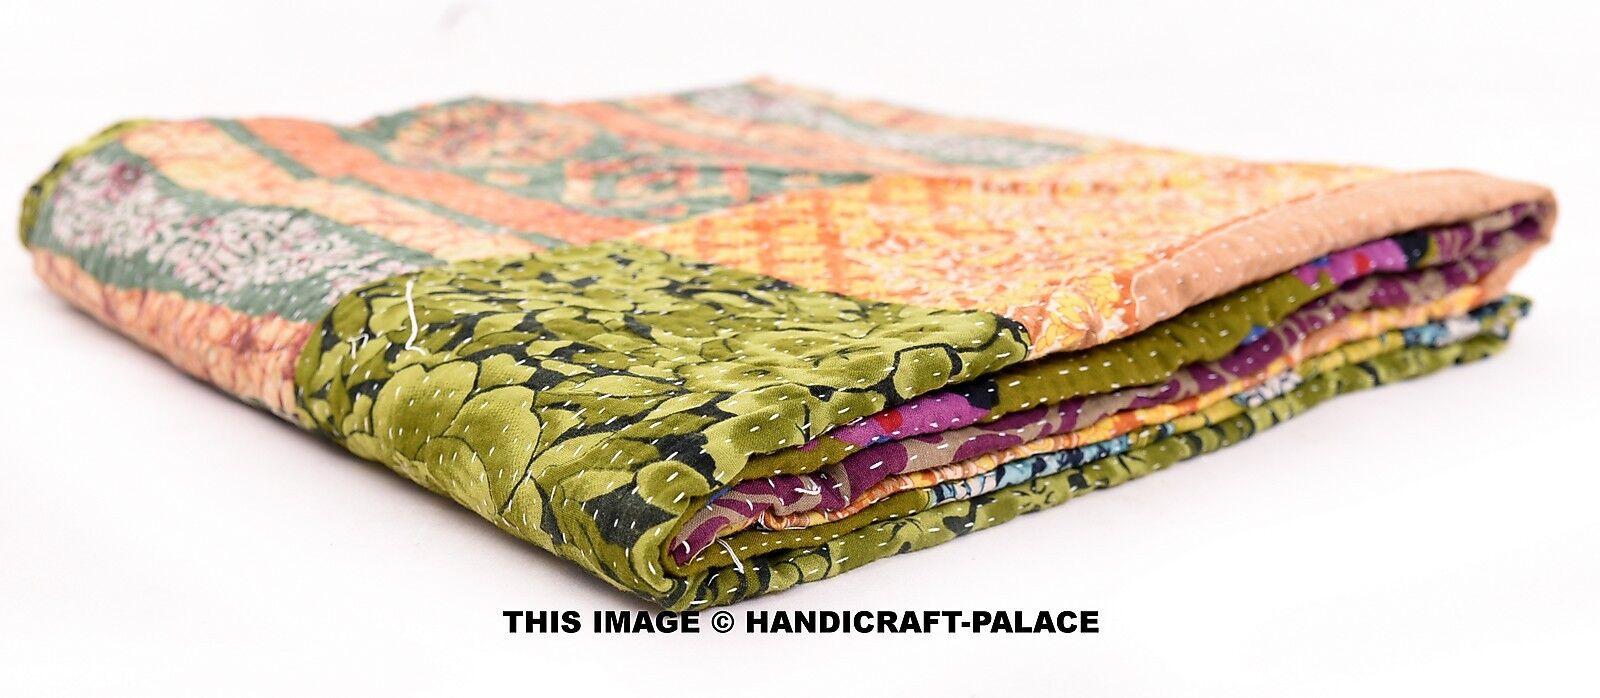 Indian Vintage Kantha Quilt Patchwork Cotton Twin Bedspread Home Decor Blanket